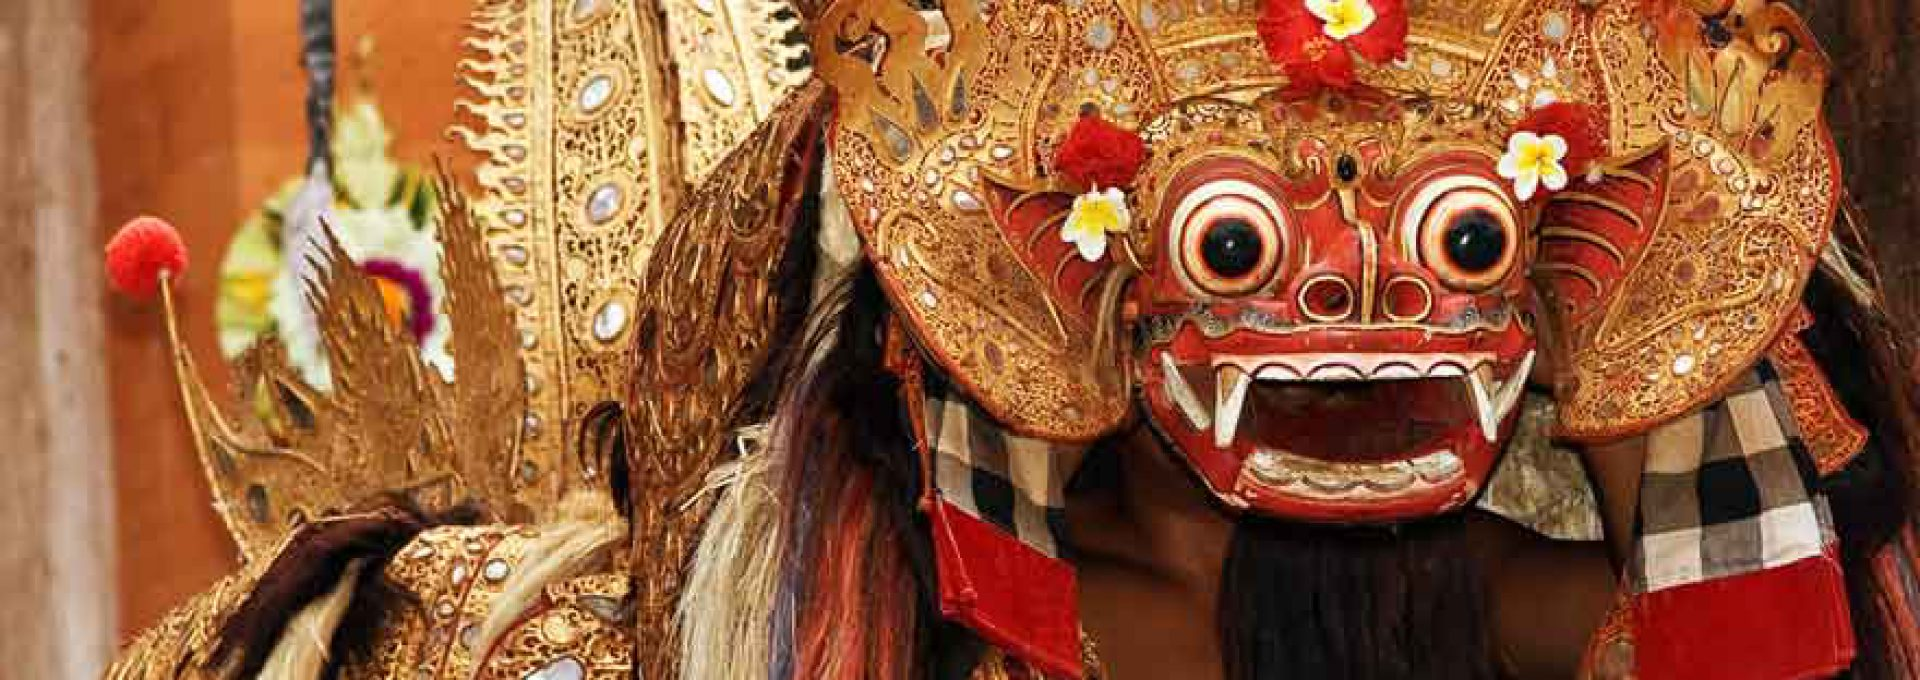 Budi Bali Tours